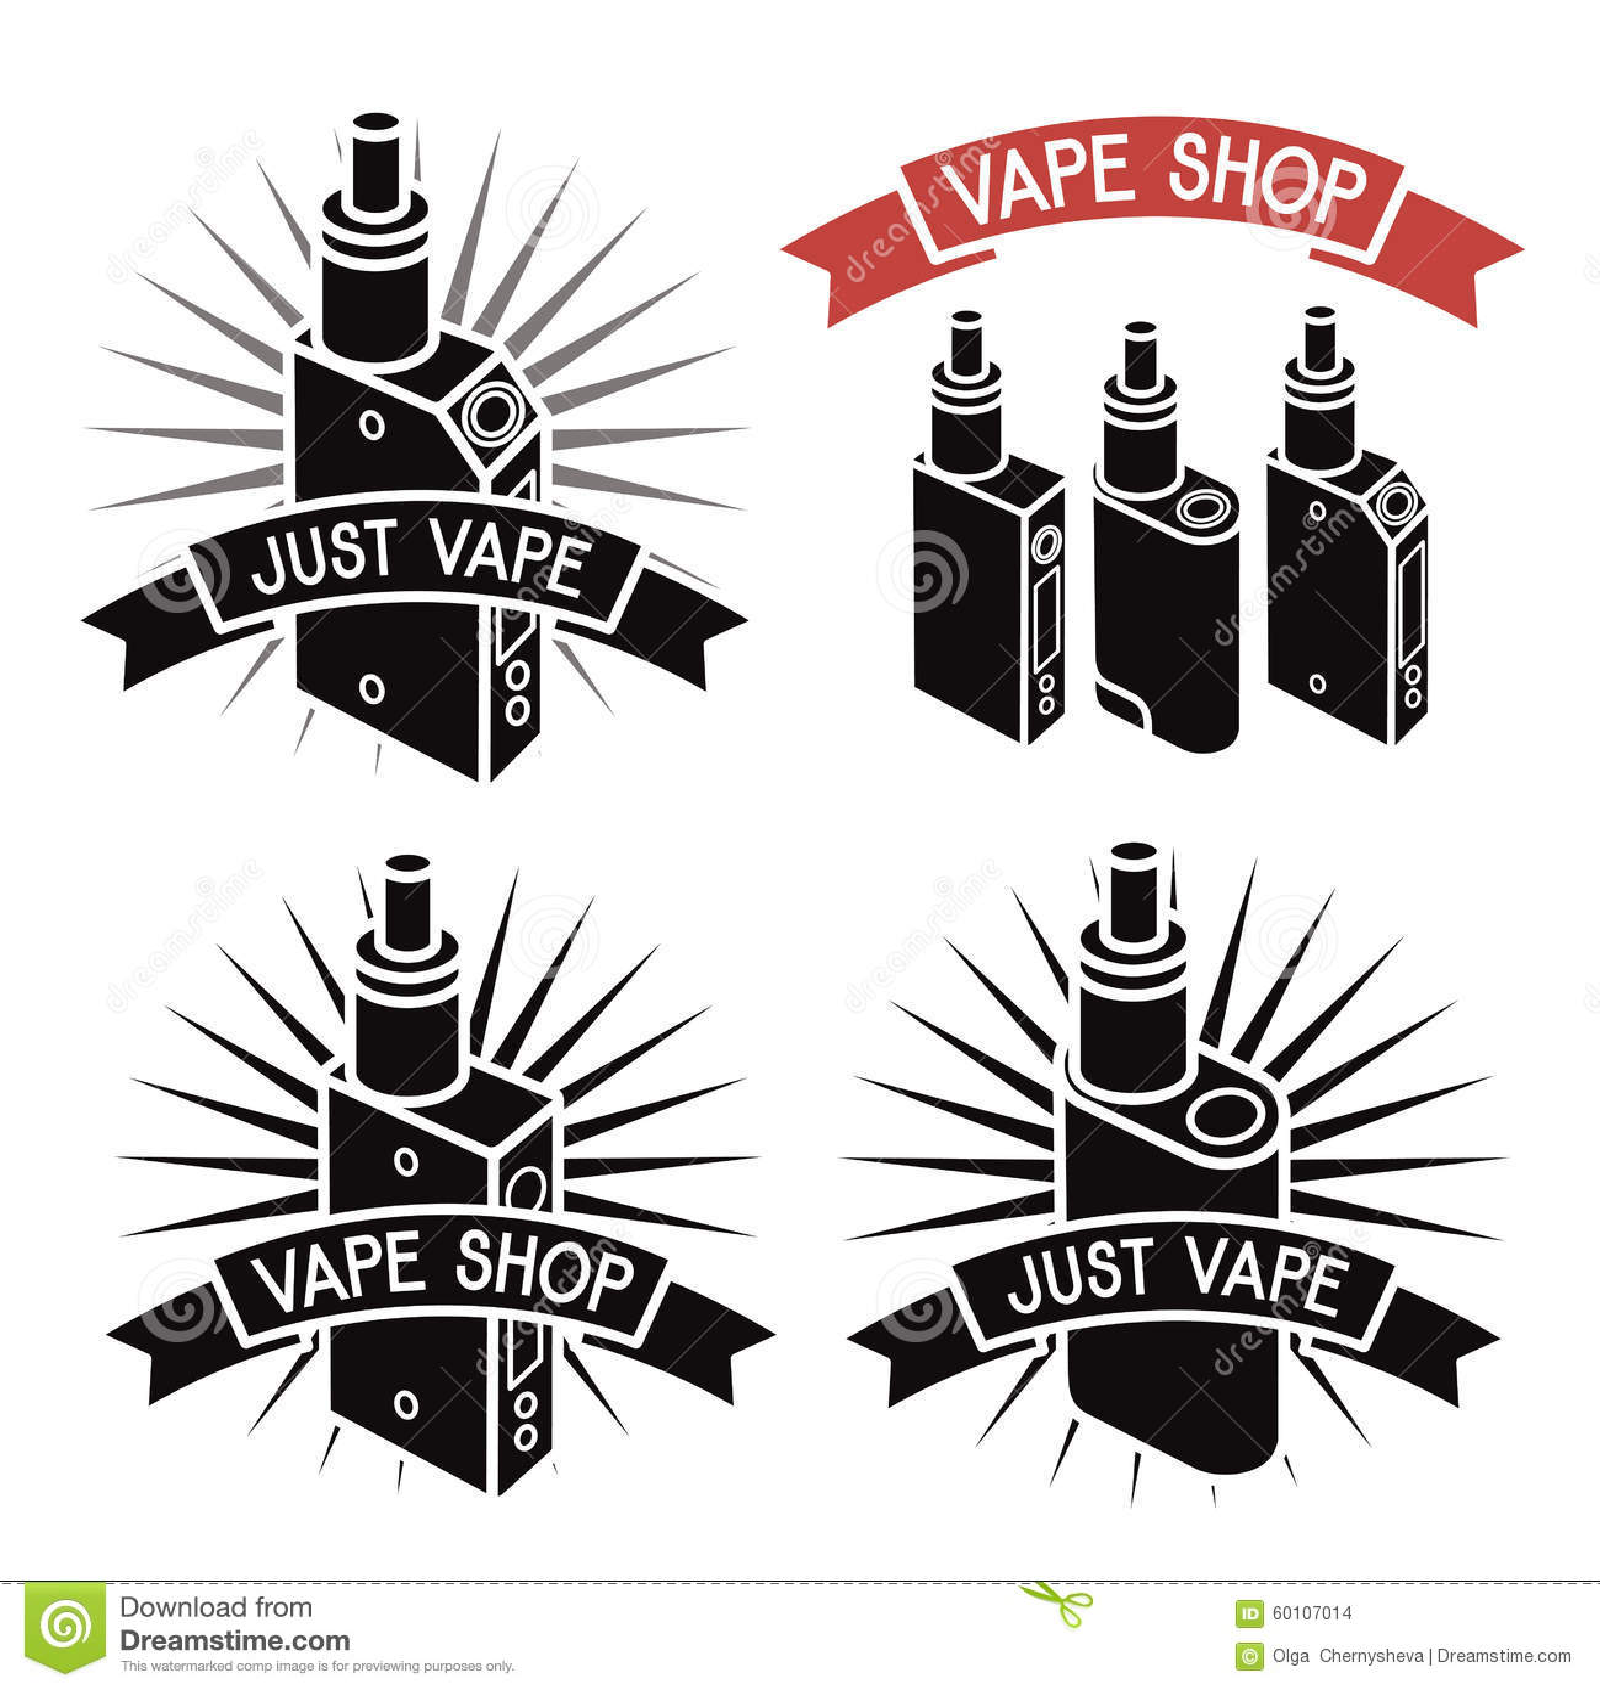 Vape Shop Logo Vector Illustration